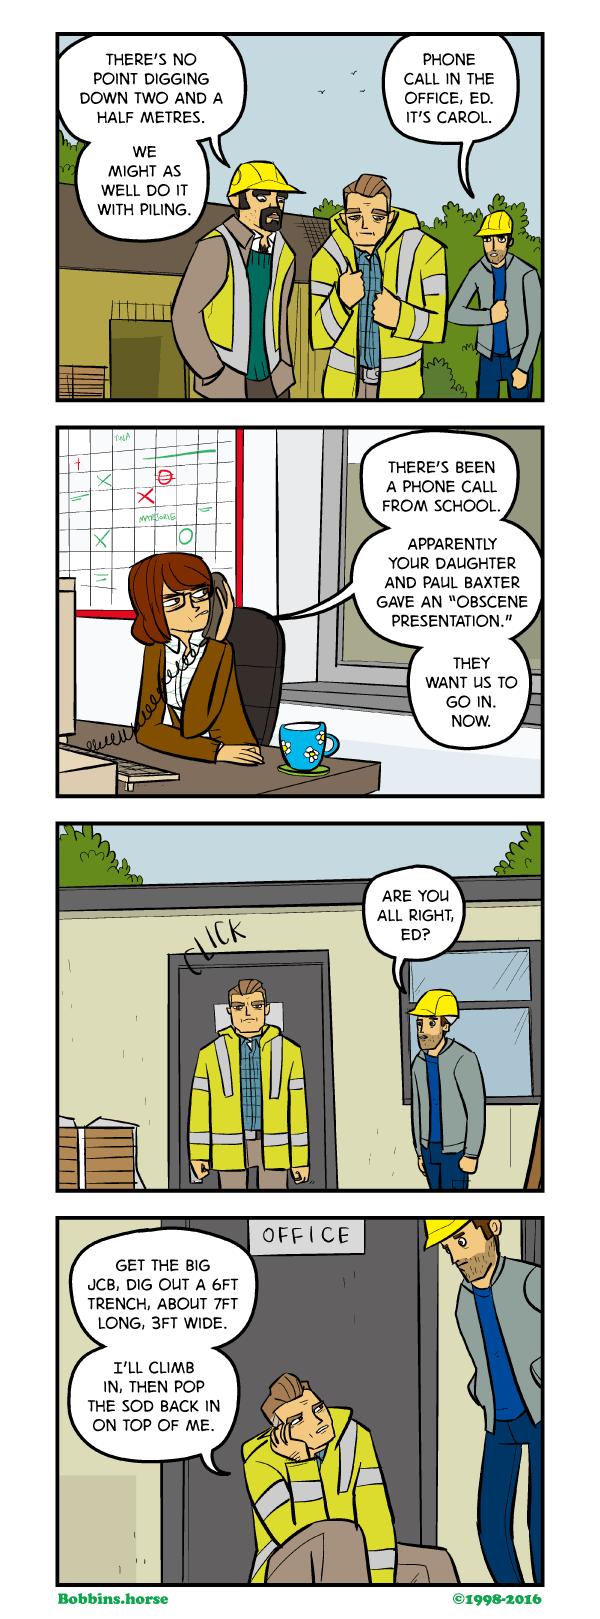 2016-04-22